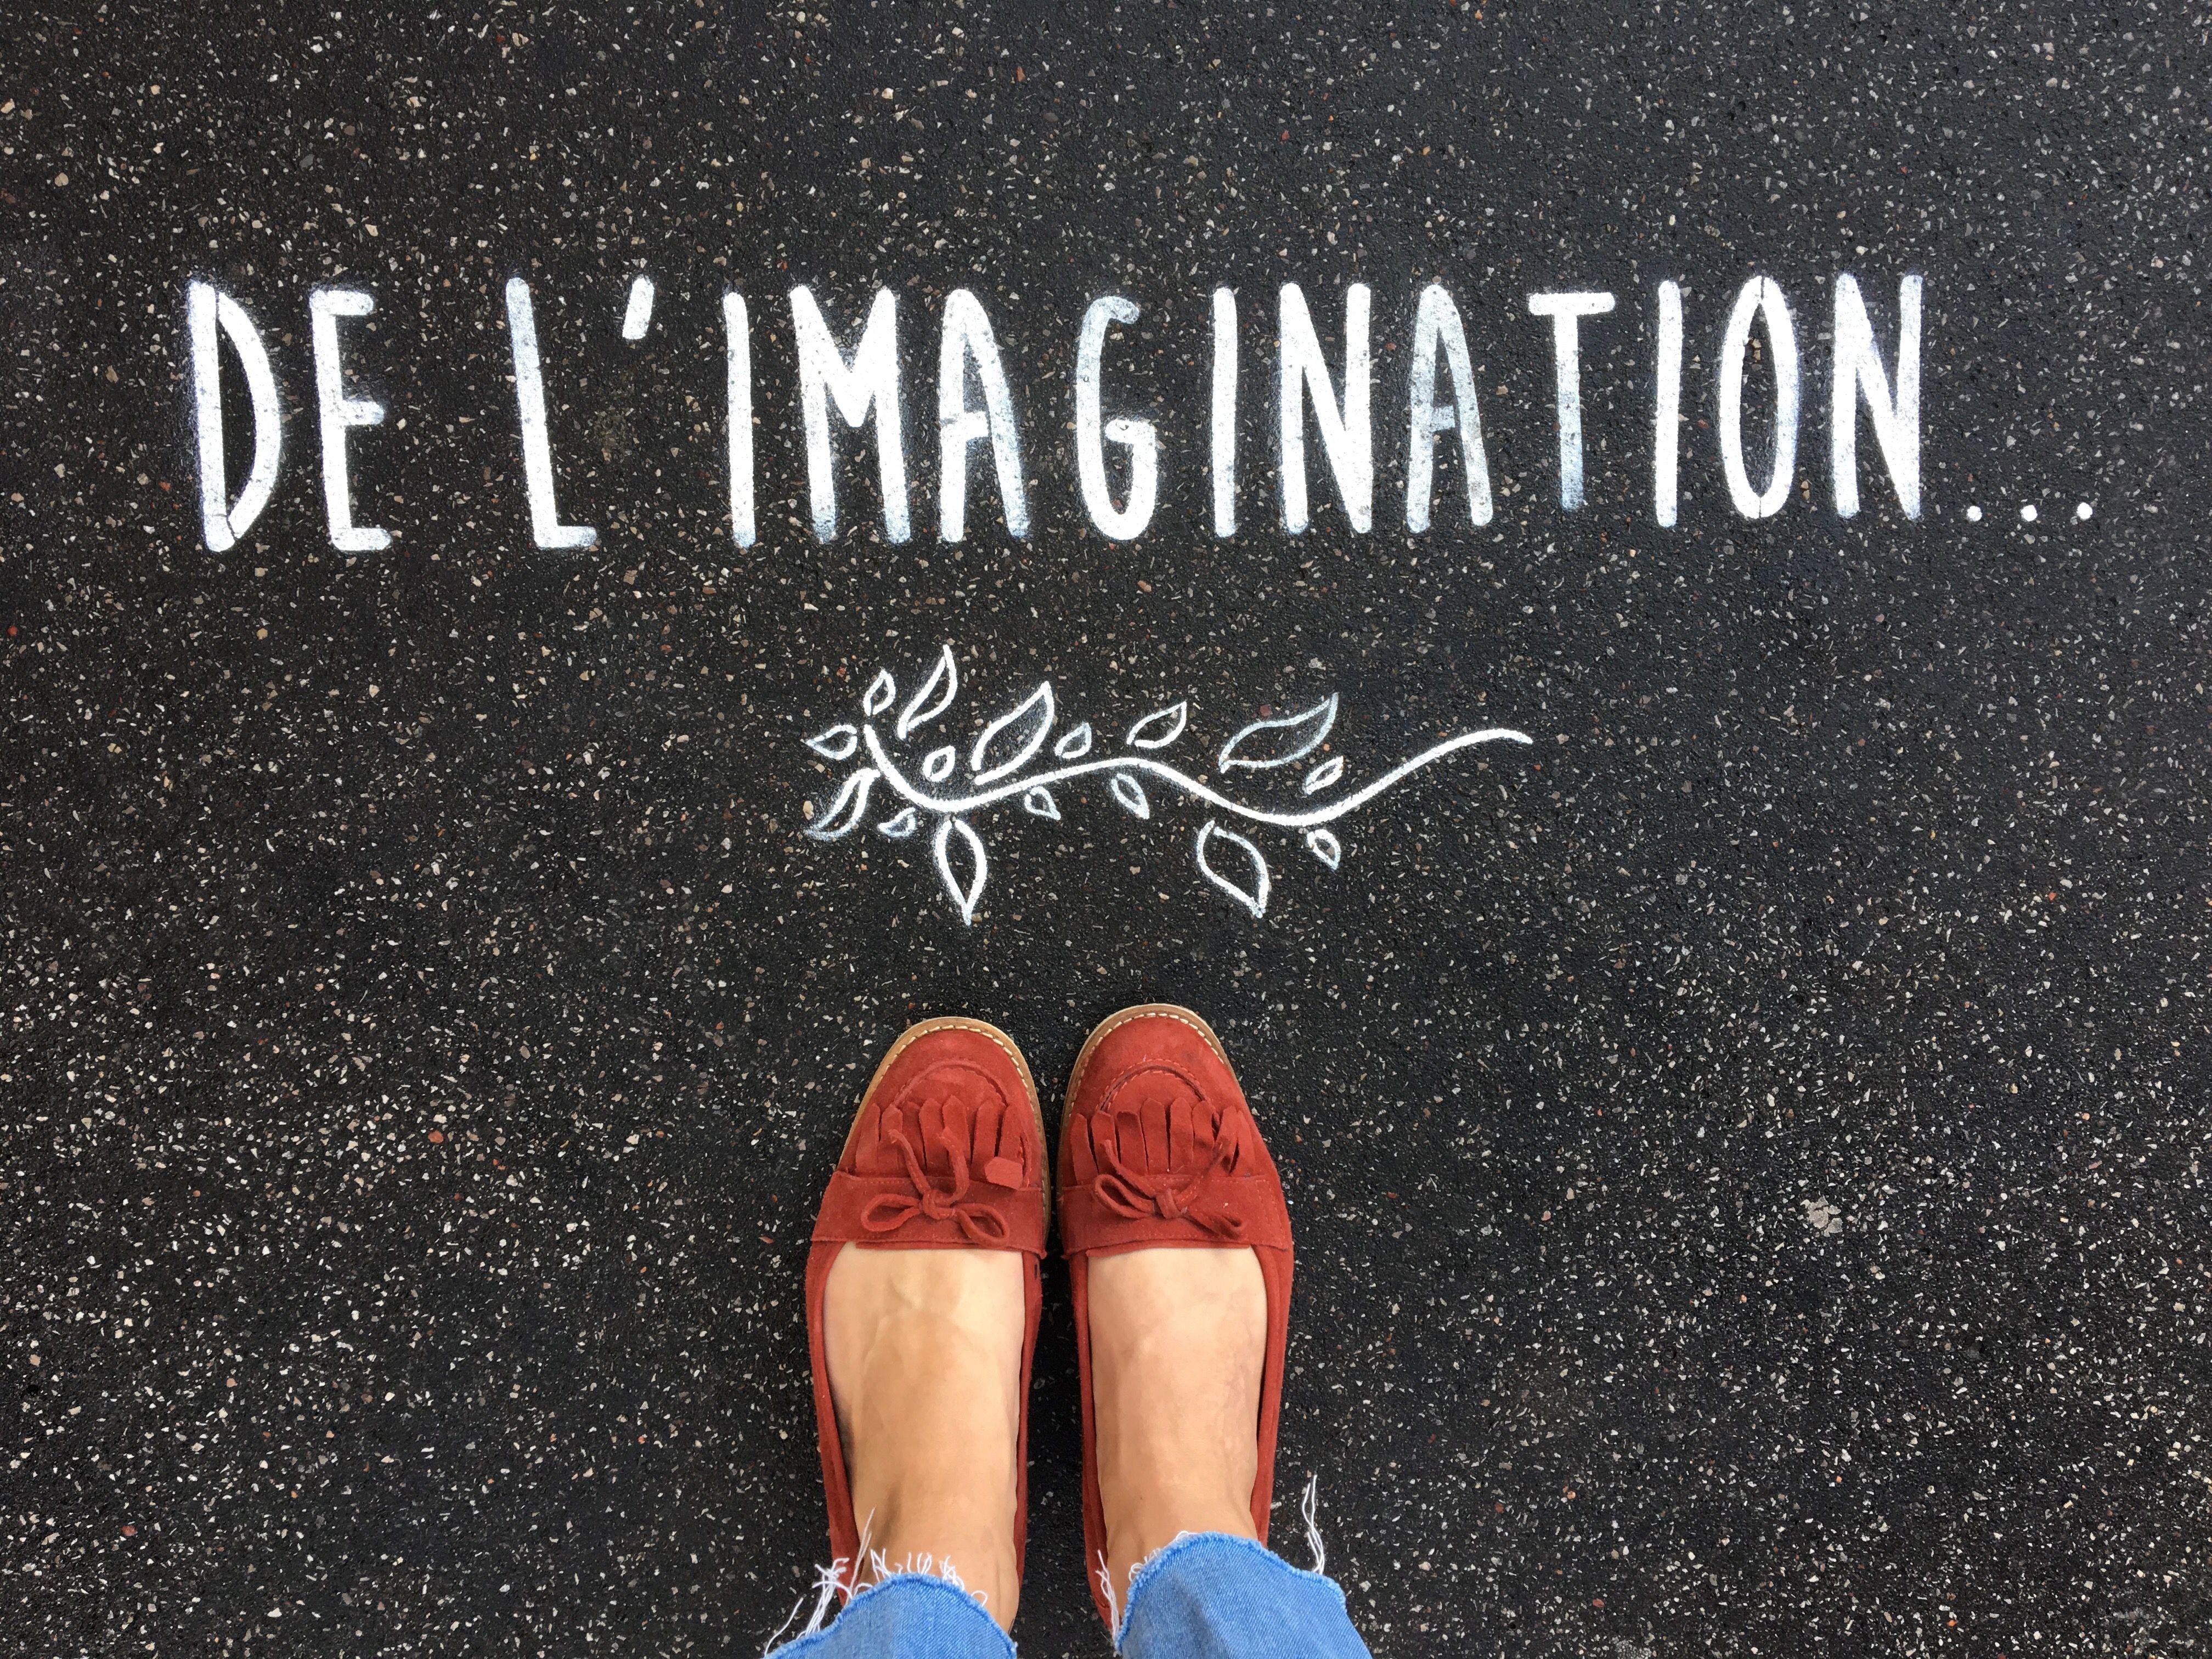 De l'imagination... In the streets of Paris • By Fantine & Simon • #paris #streetart #urbanart #graffiti #stencil #fantinetsimon #photography #love #amour #wild #iloveyou #flowers #paris #elegance www.fantineetsimo... ©Fantine&Simon 2 sem